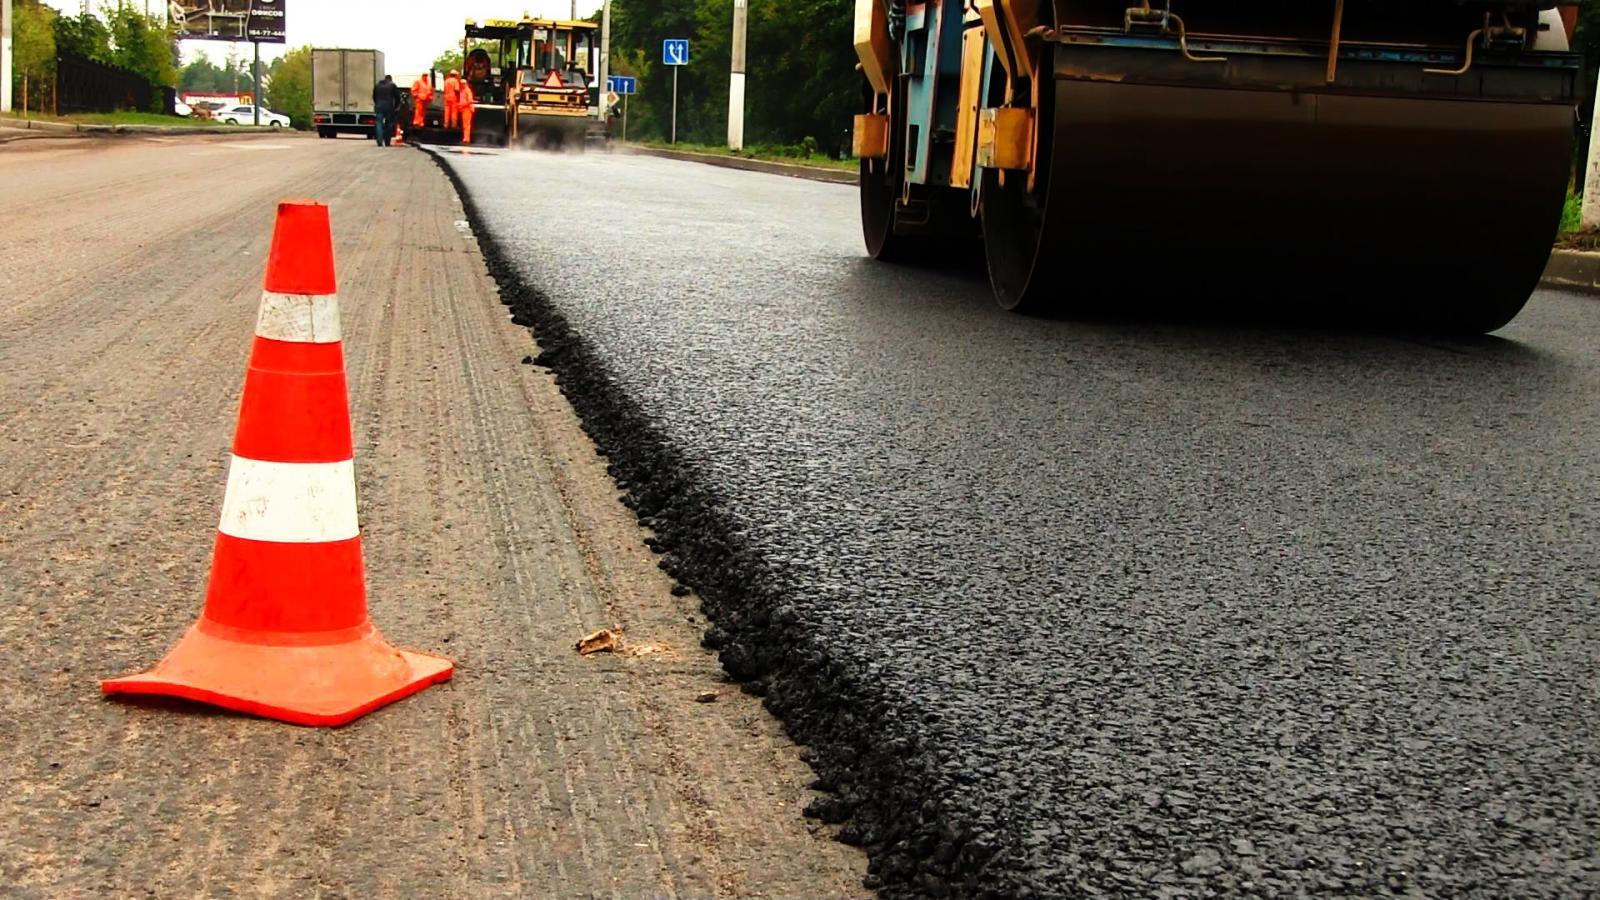 В Брянске горожане ждут окончания ремонта тротуара на улице Бежицкой